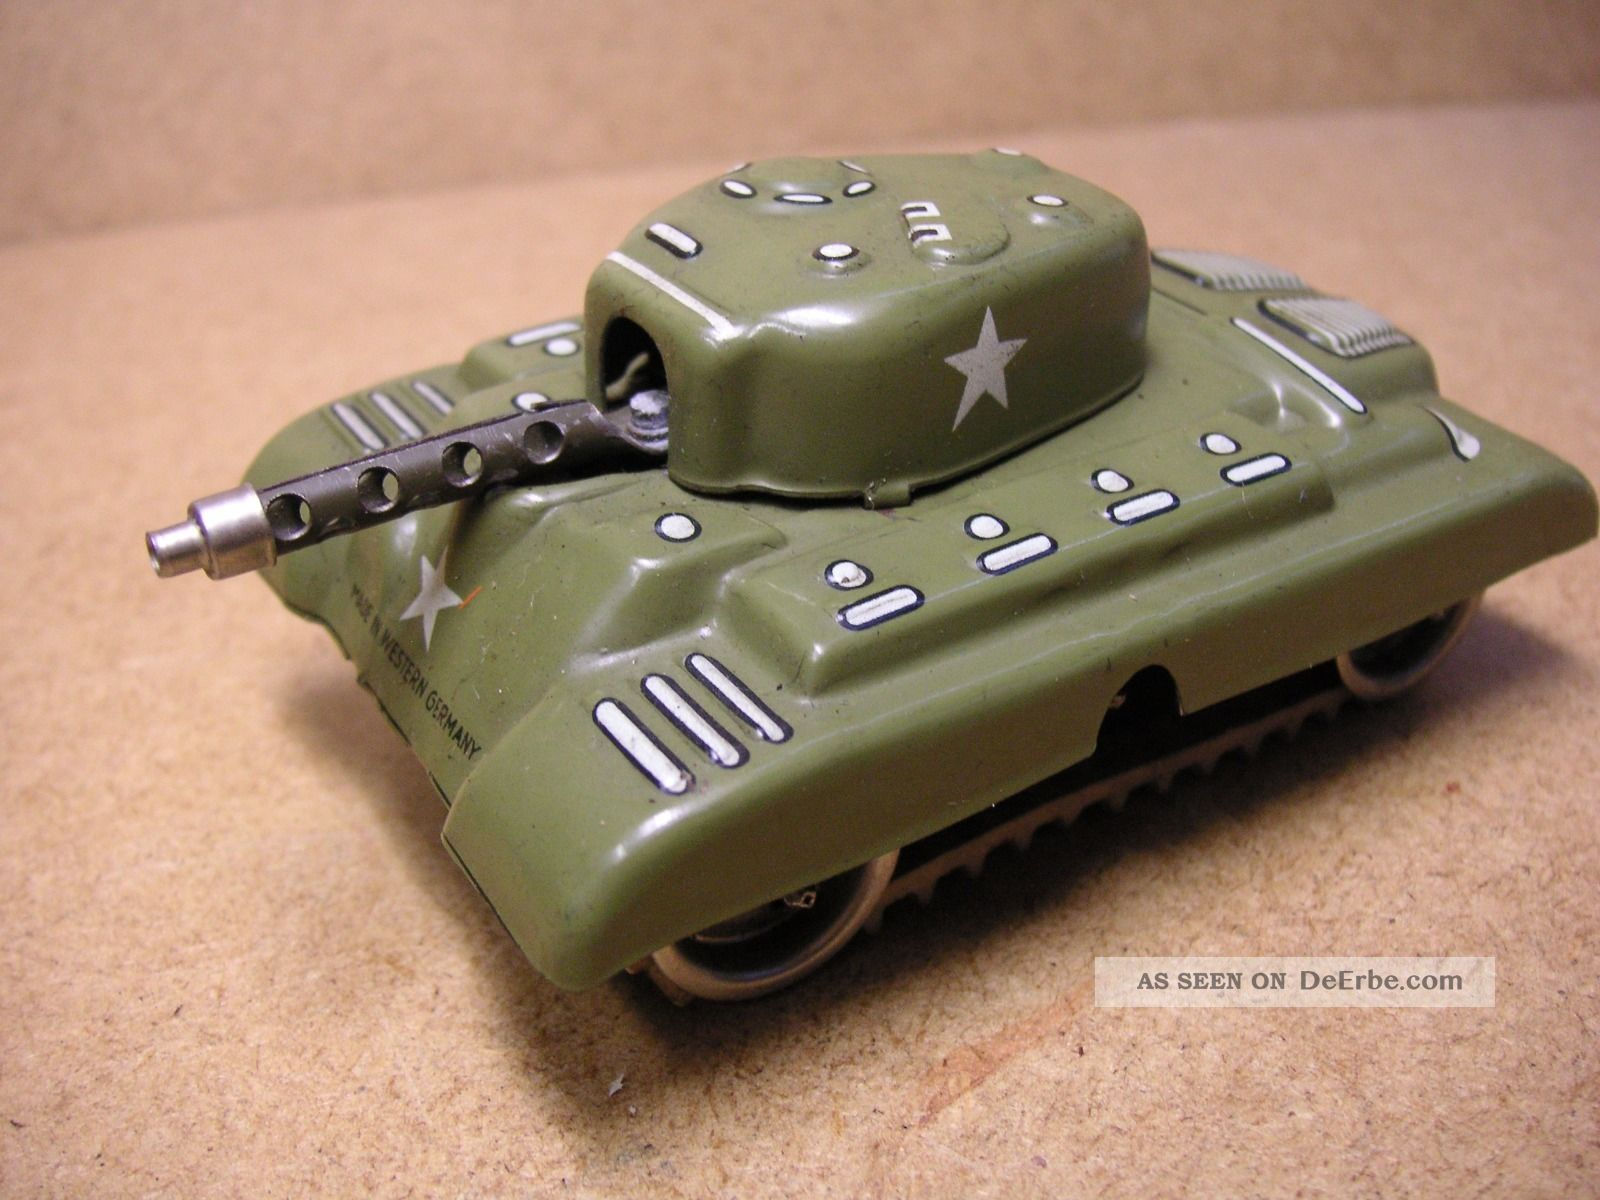 Pennytoy Gama Panzer Tank Blech Uhrwerk W.  Germany Tin Tole Latta Original, gefertigt 1945-1970 Bild